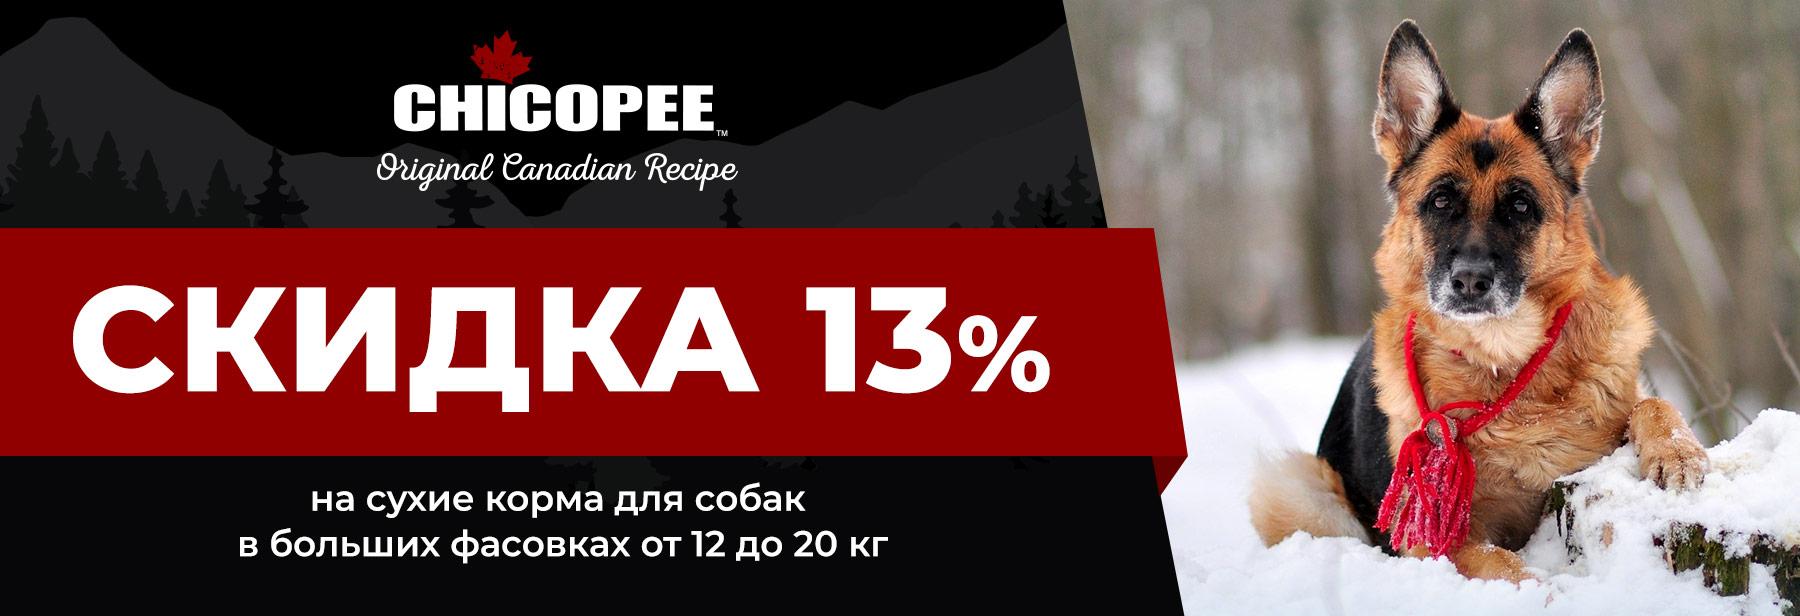 Скидка 13% на Chicopee HNL 12 кг и PNL 20 кг и CNL 15 кг